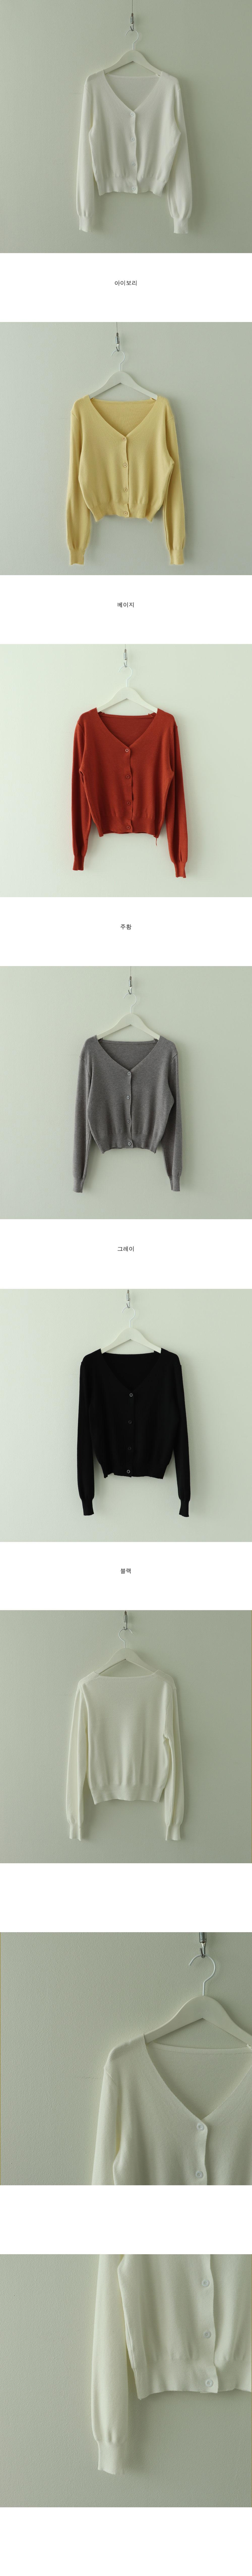 Bagel Basic Short V Neck Knit Cardigan